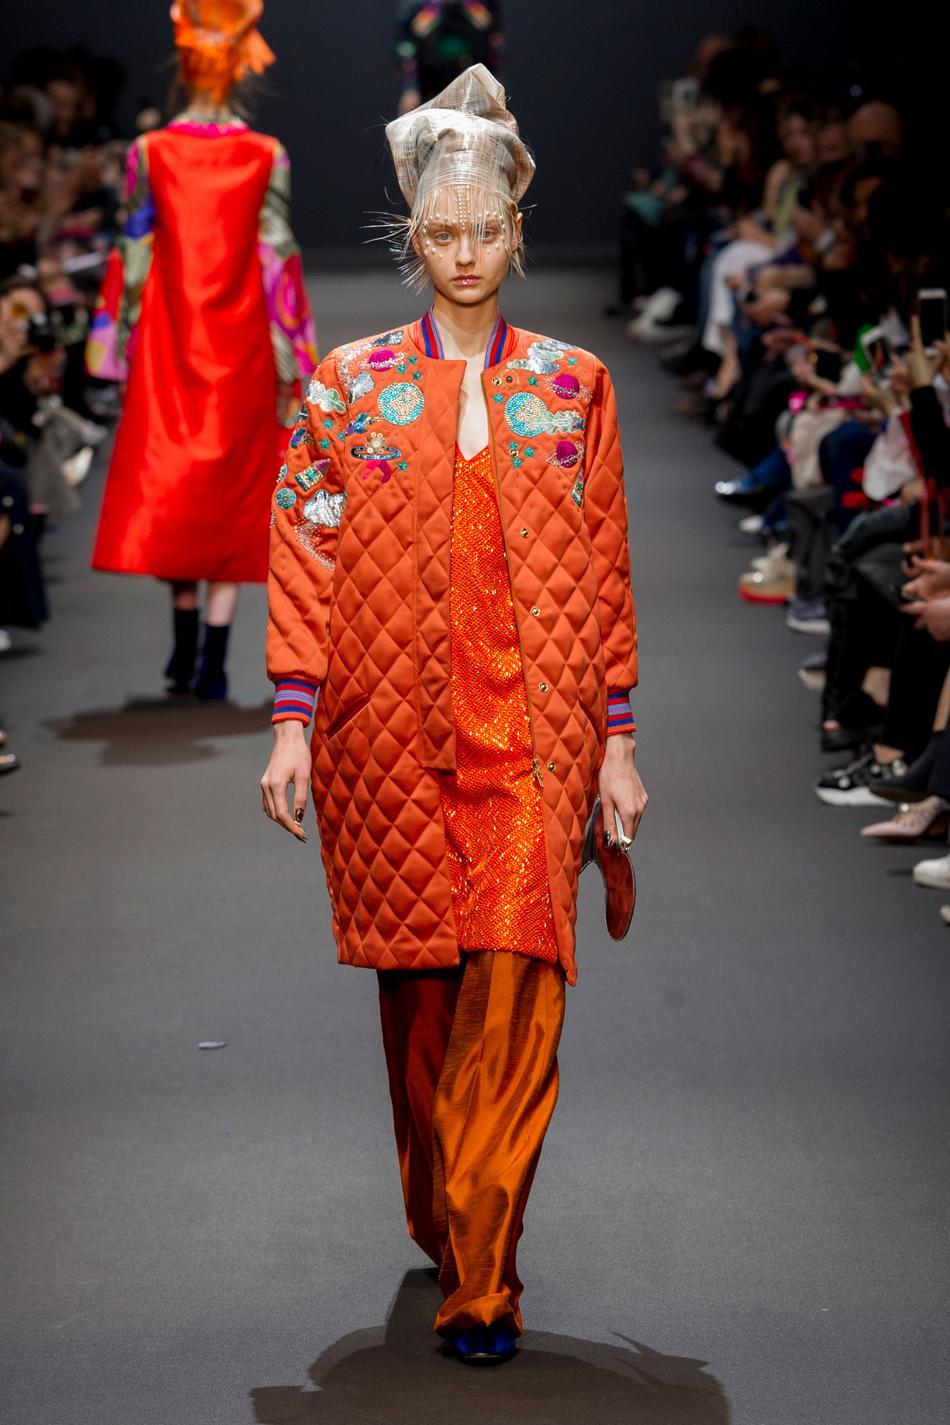 Défilé Manish Arora Fashion Week 2017 - Look 20